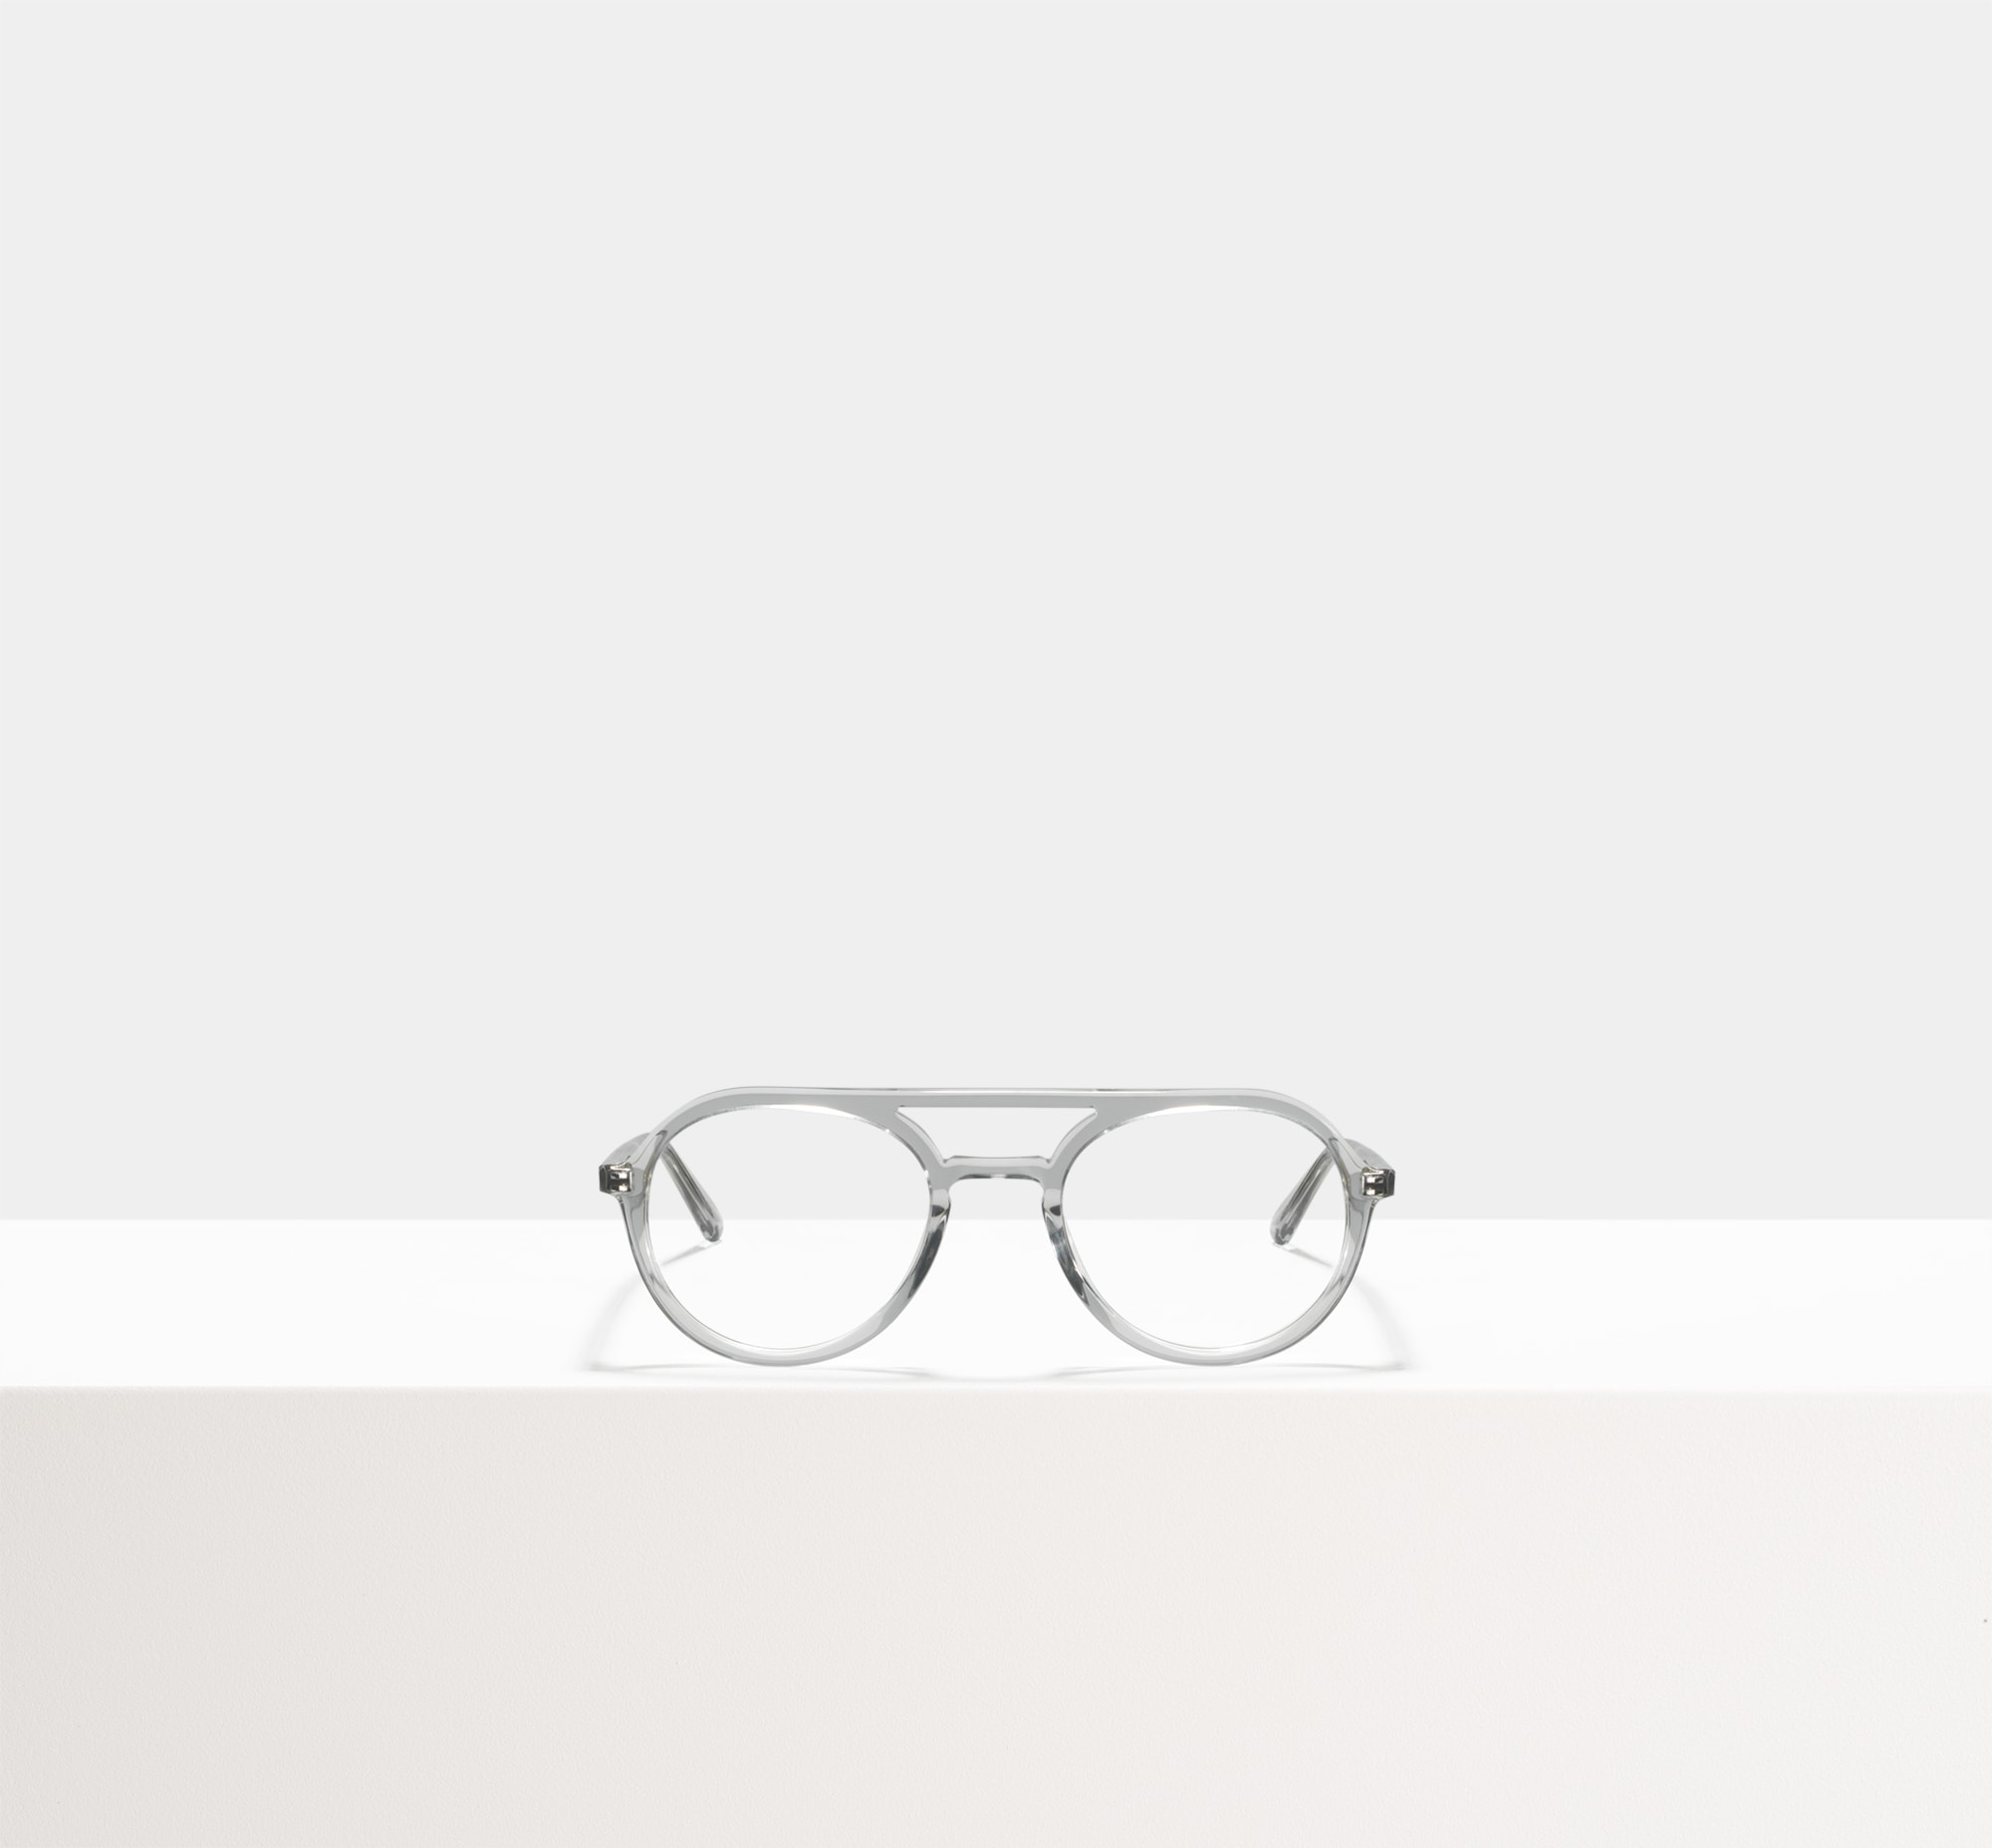 Rectangular sunglasses in Silver Ace & Tate